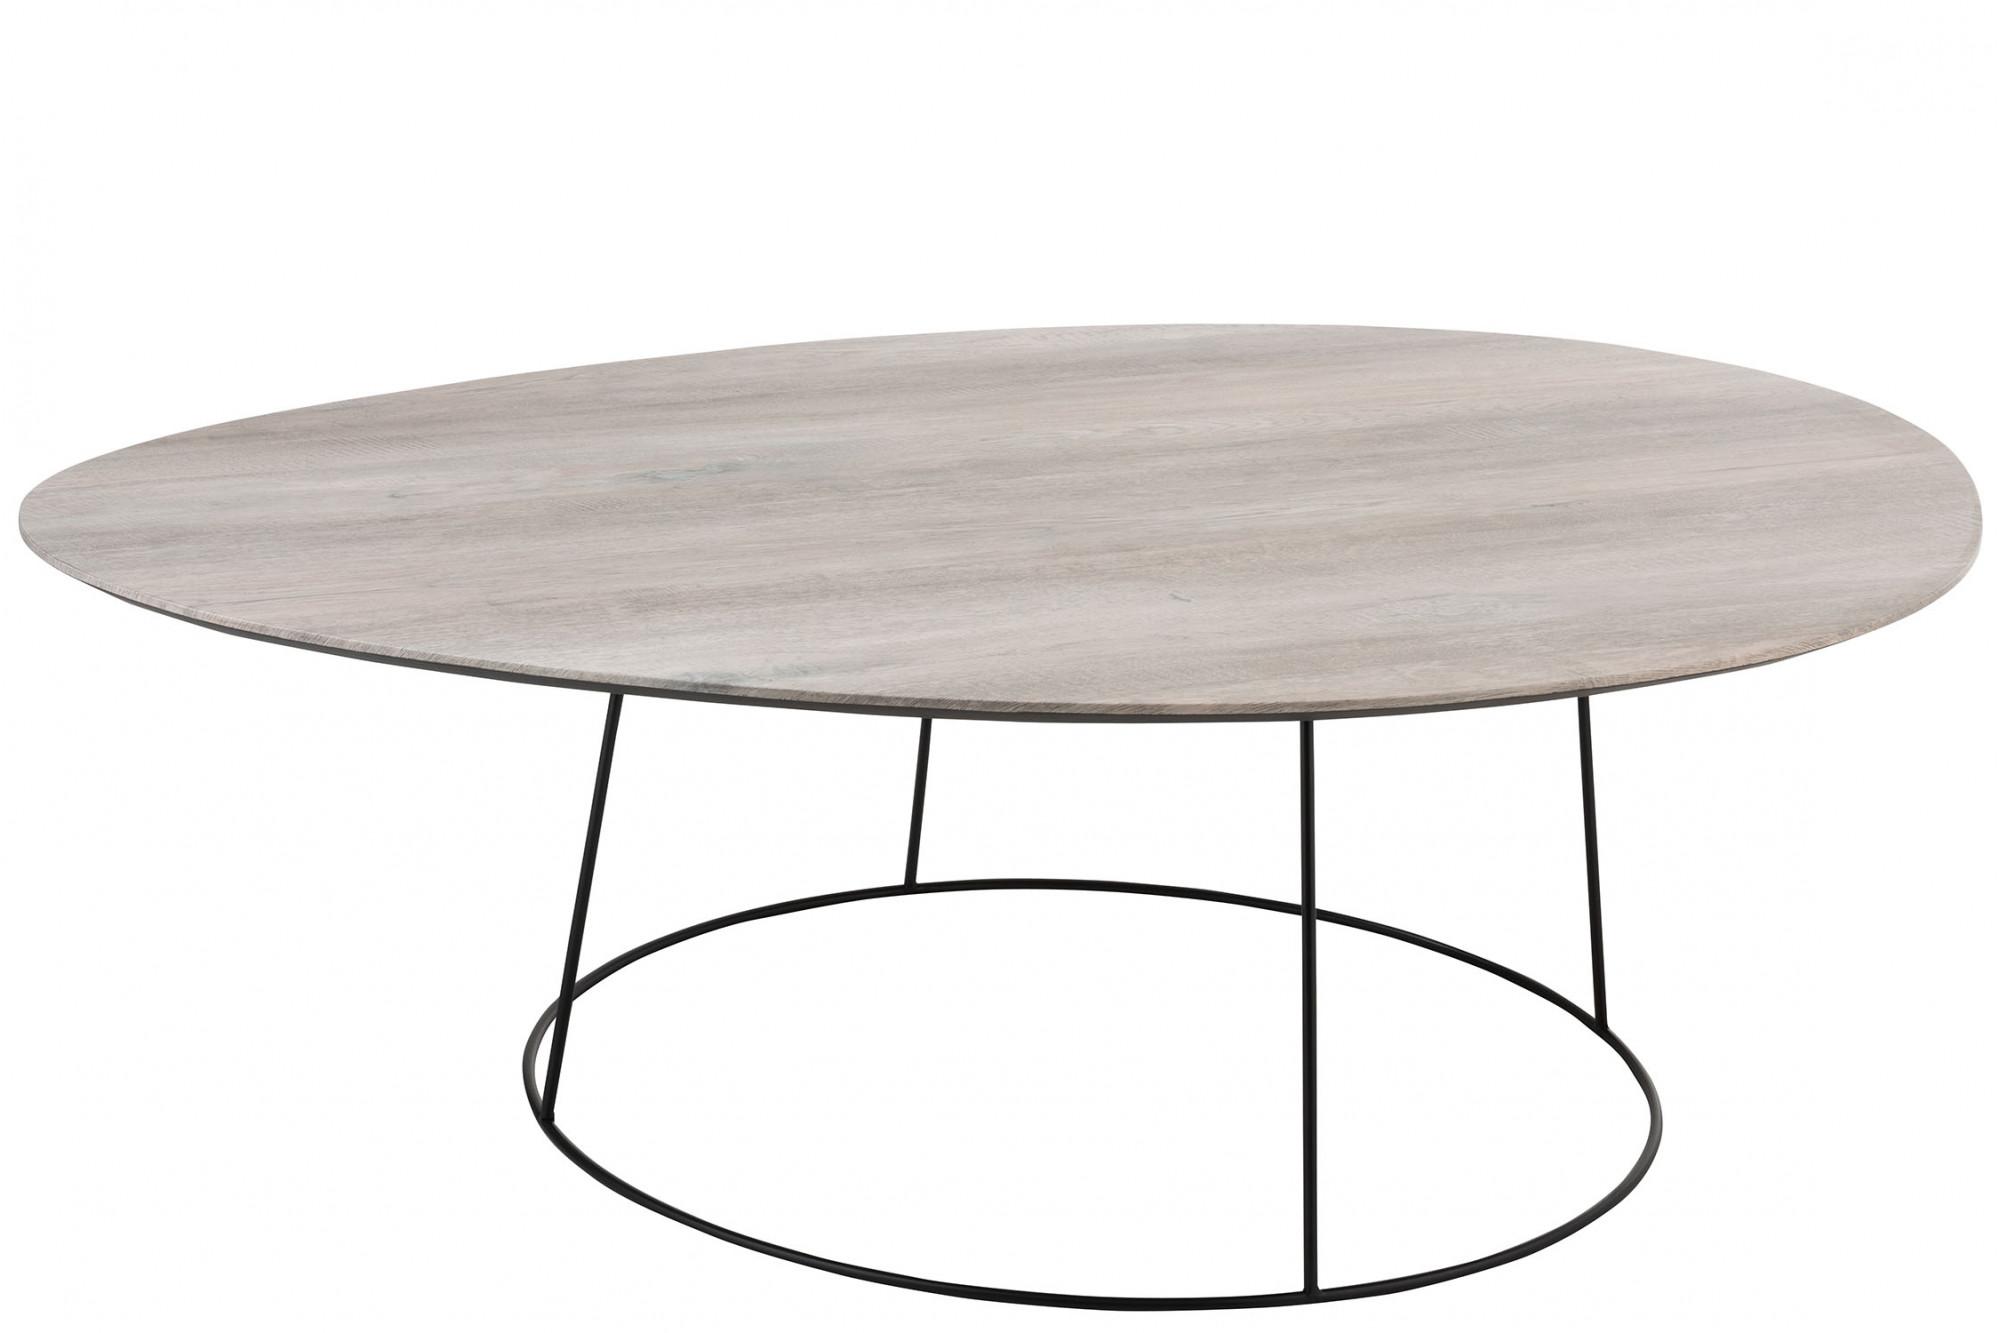 Grande Table Basse Bois table basse moderne avec plateau ovale en bois clair - hellin